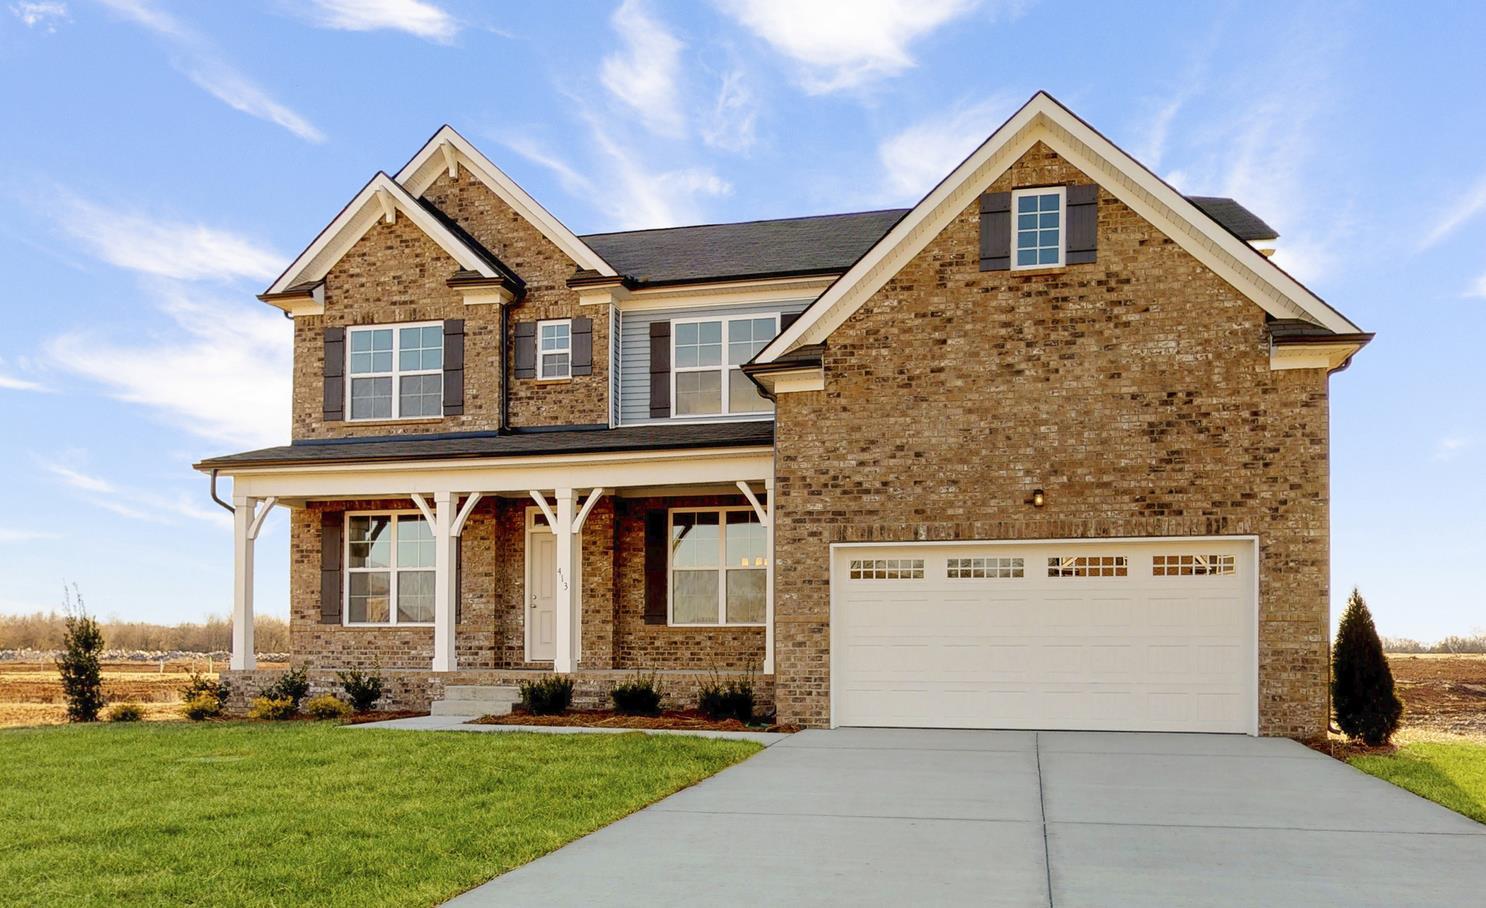 413 Davenport Drive Lot 16, Murfreesboro, TN 37128 - Murfreesboro, TN real estate listing